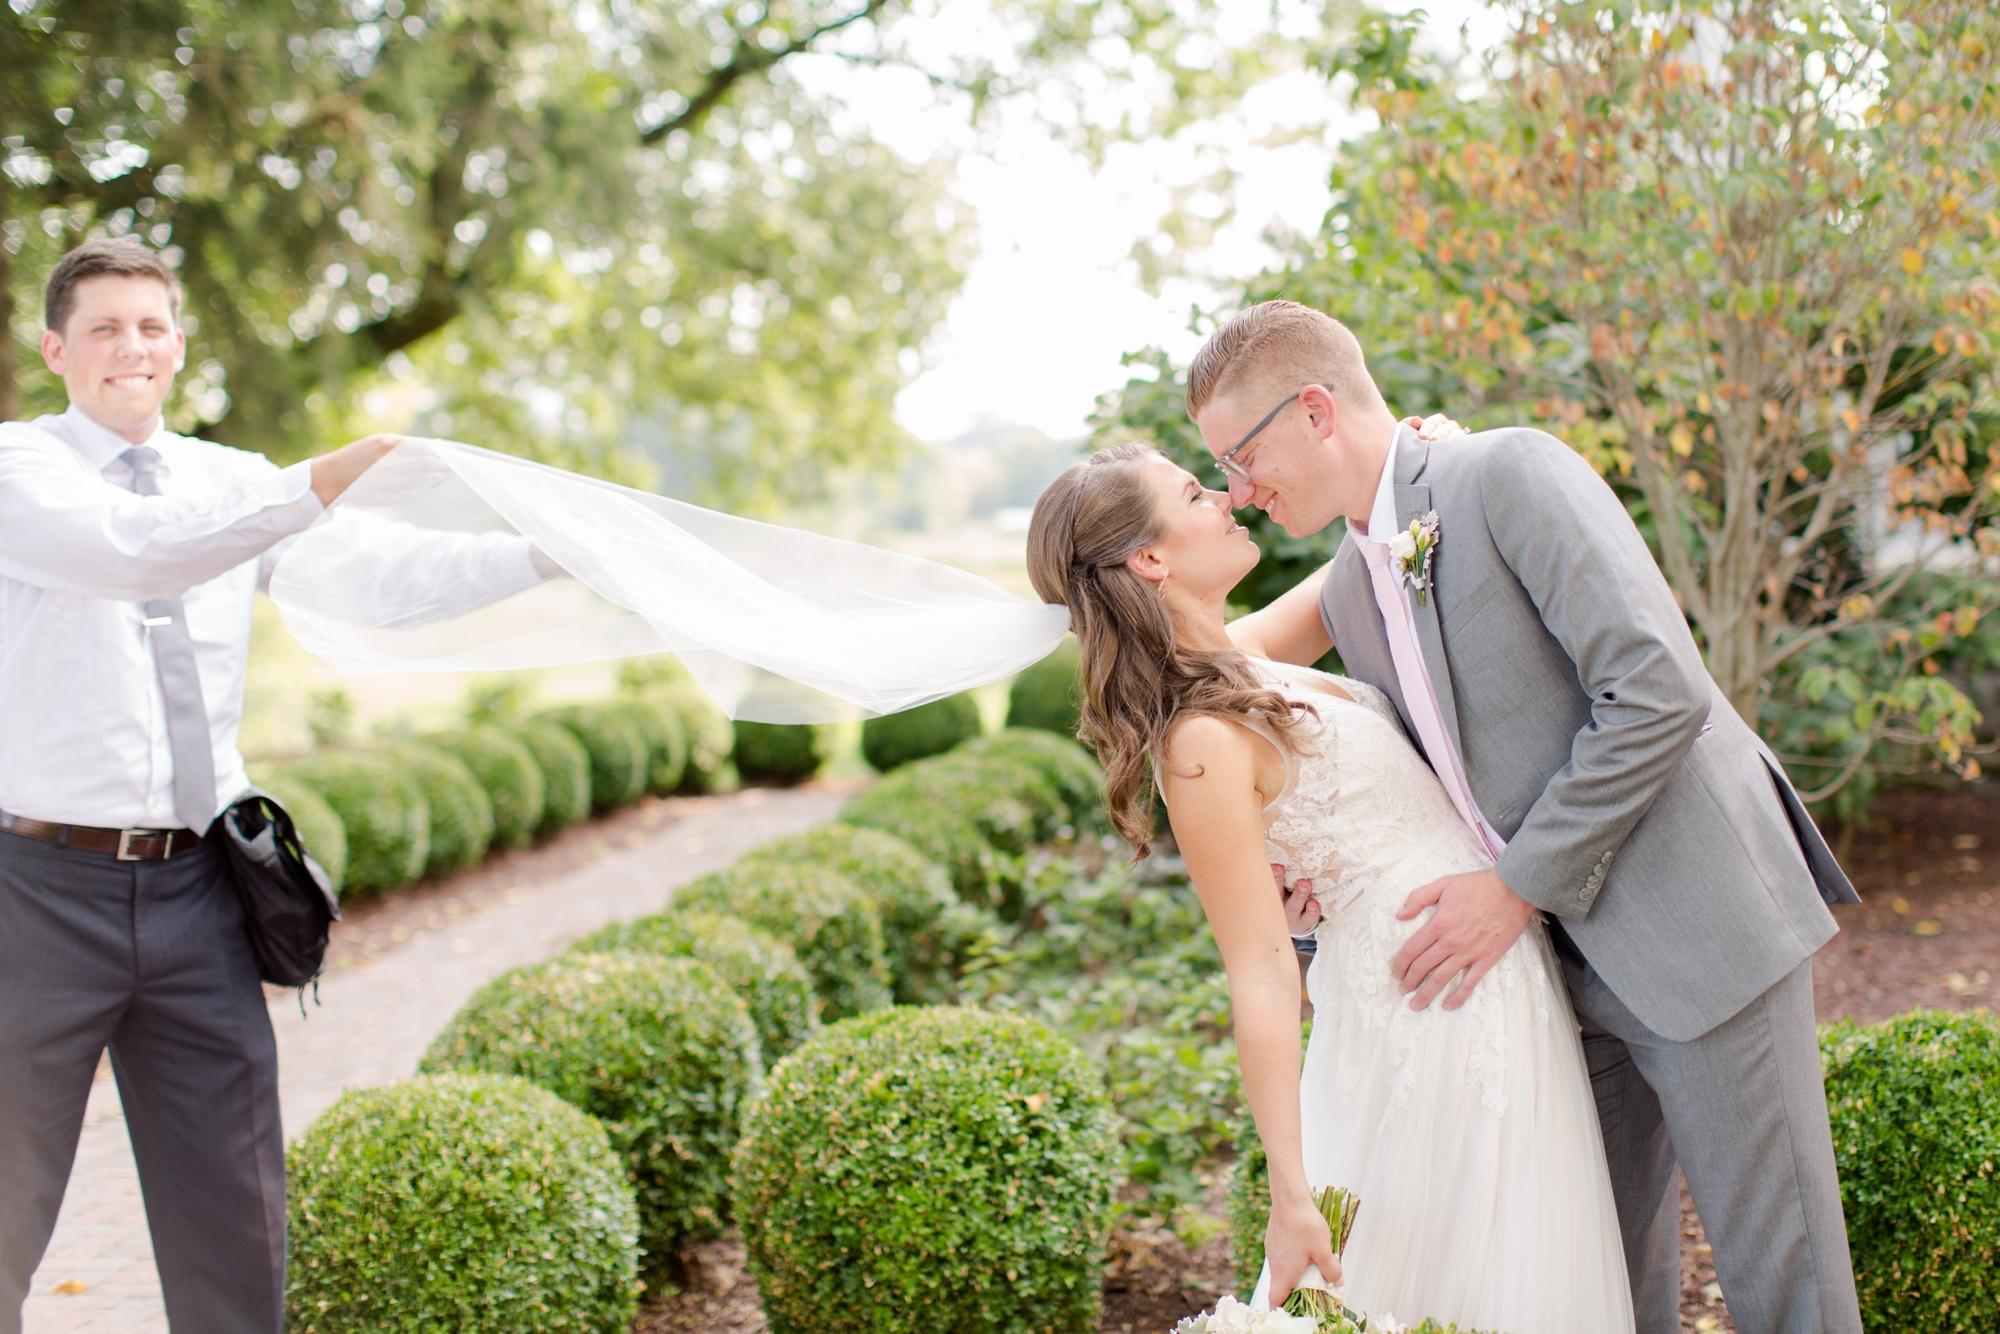 Tomaszewski 3-Bride & Groom-1058_anna grace photography baltimore maryland and virginia wedding photographer behind the scenes wedding photo.jpg